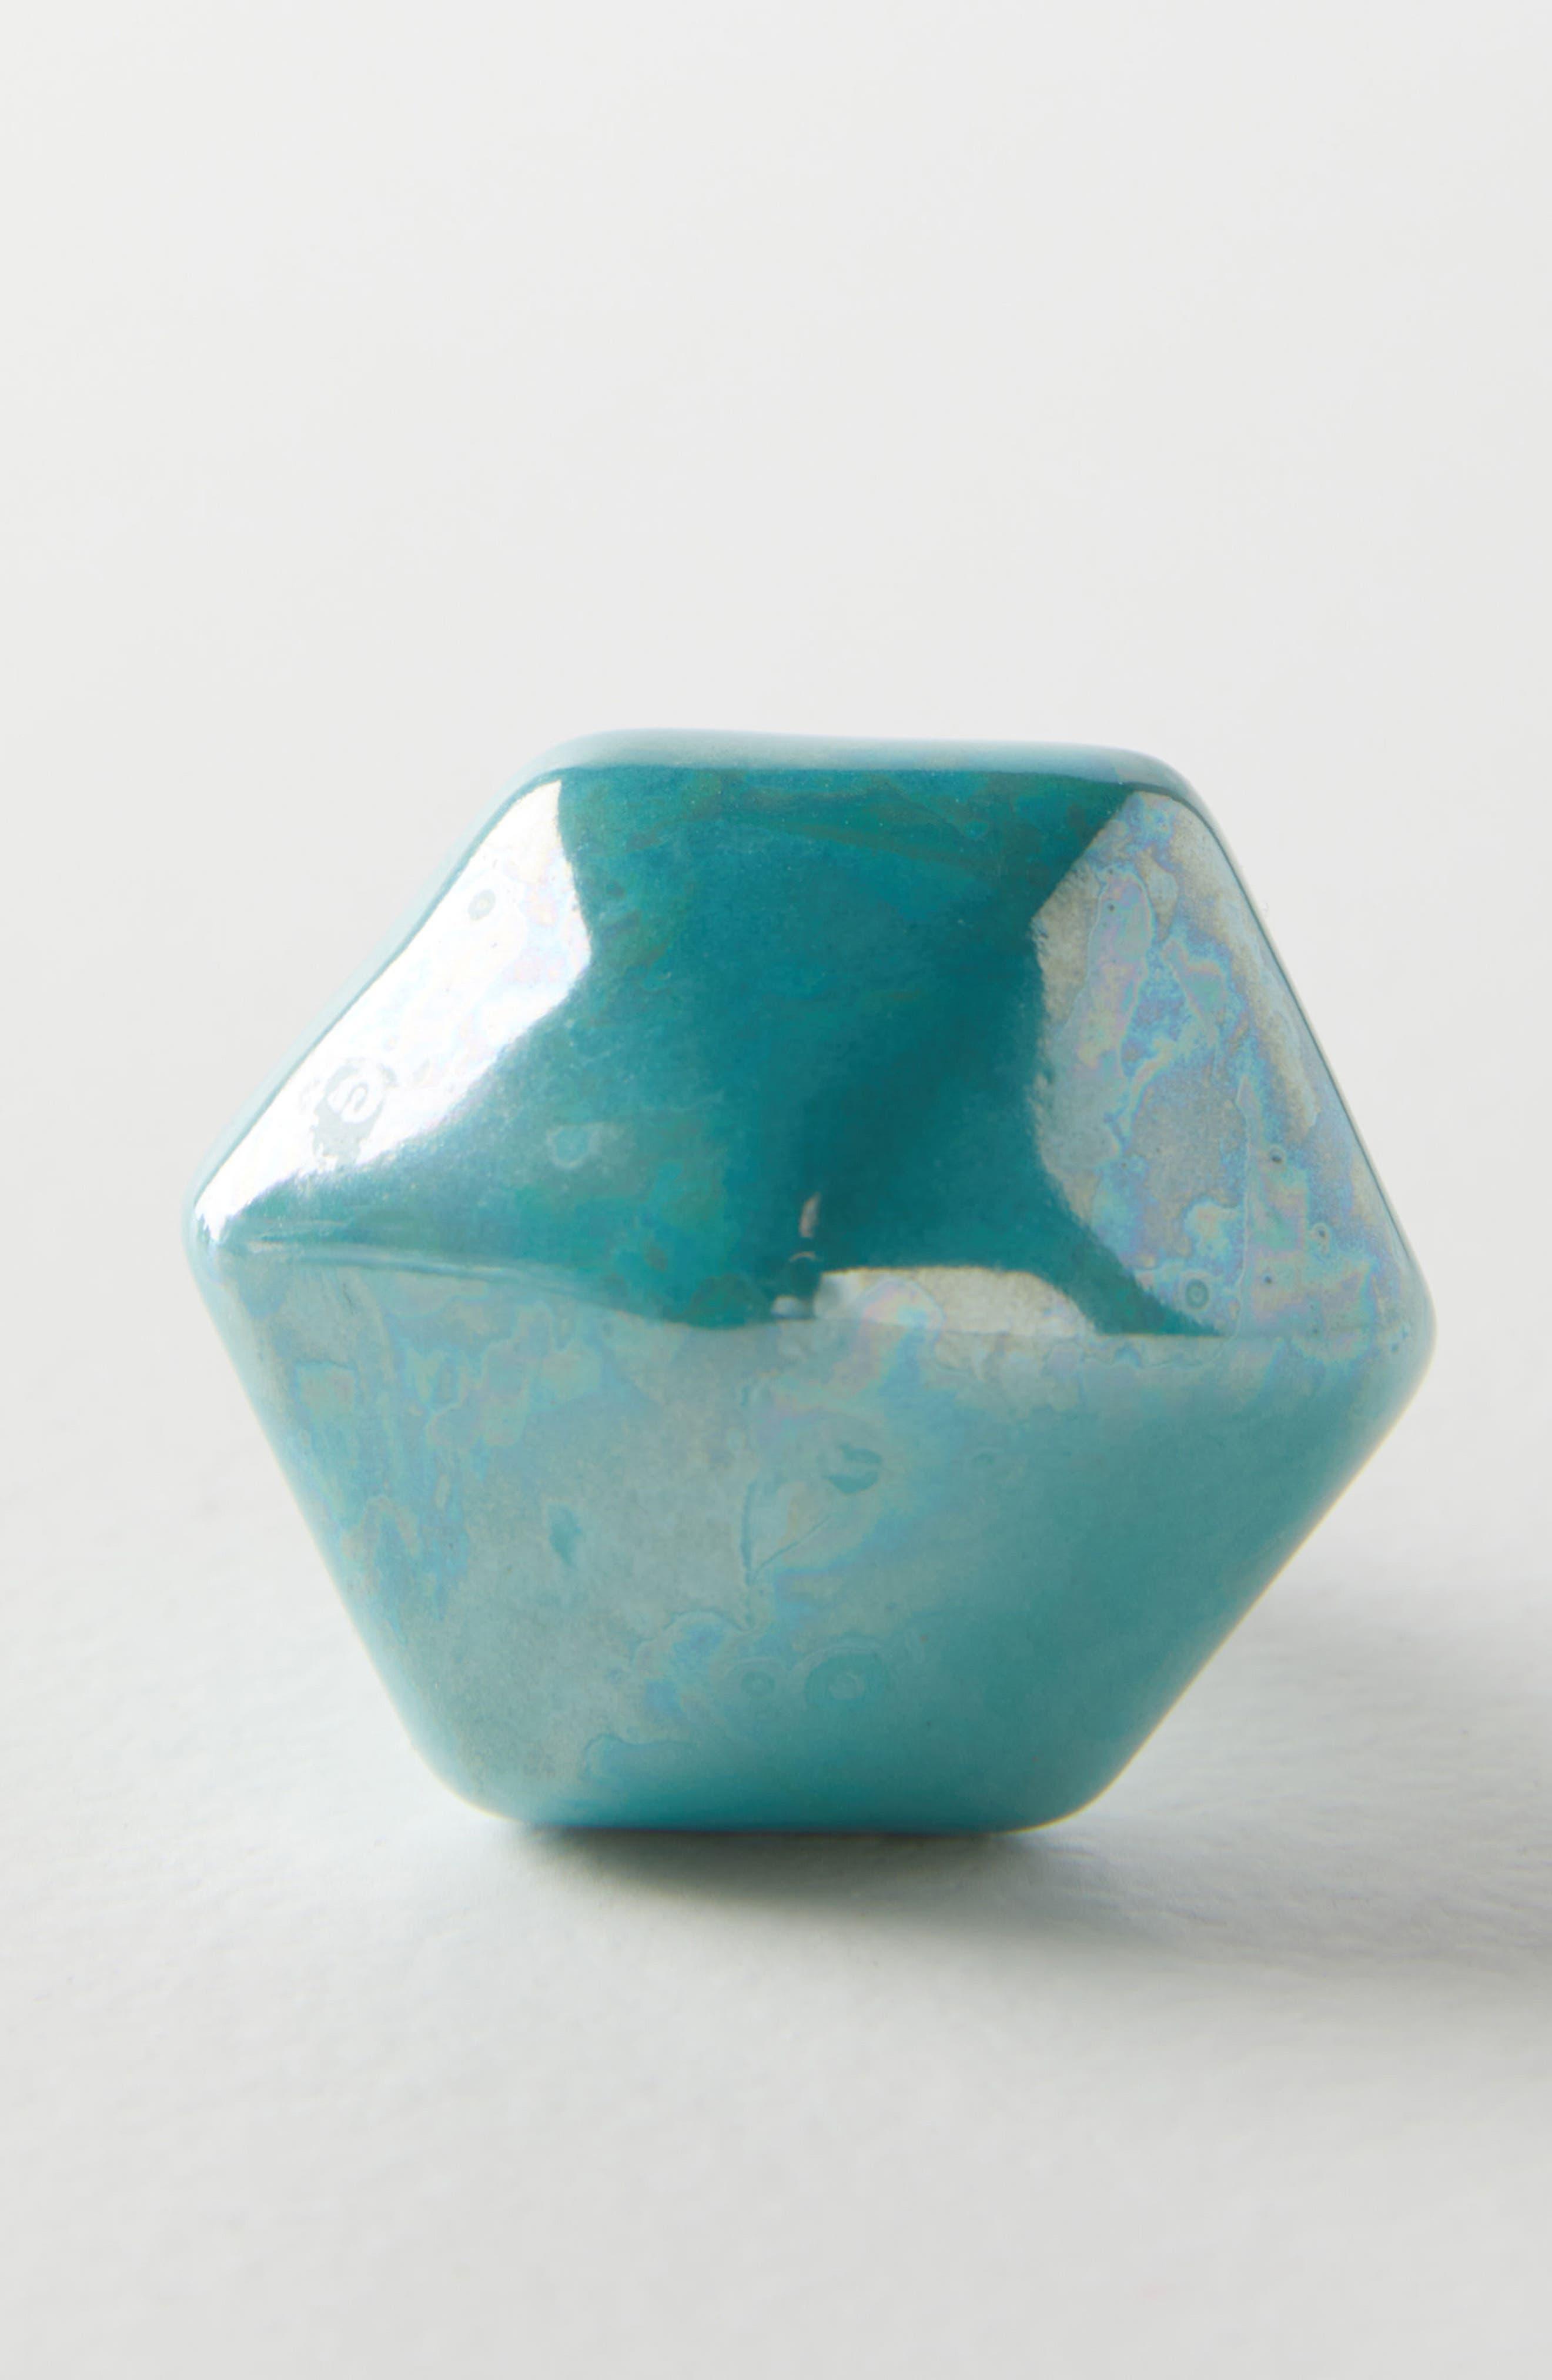 Luna Ceramic Knob,                             Main thumbnail 1, color,                             440